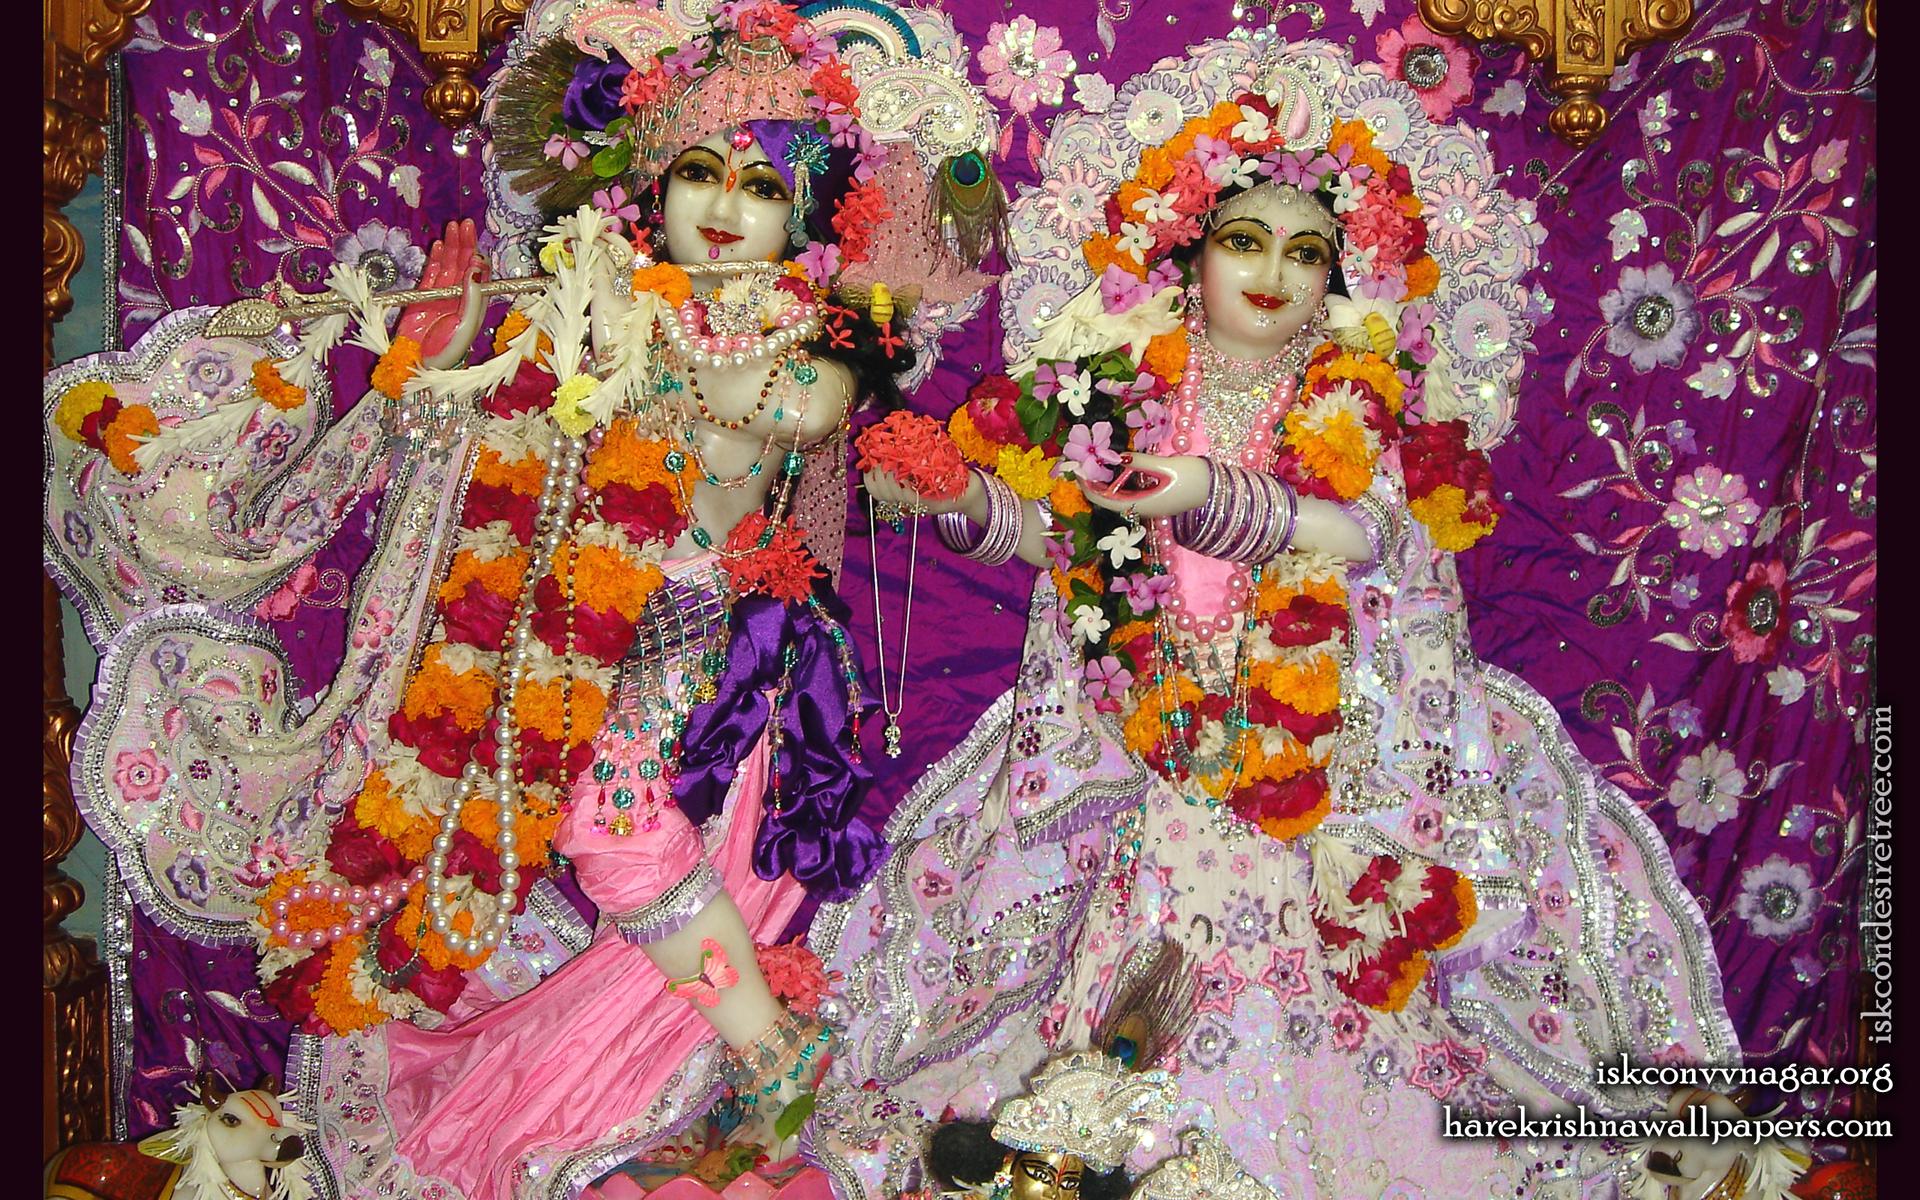 Sri Sri Radha Giridhari Wallpaper (014) Size 1920x1200 Download